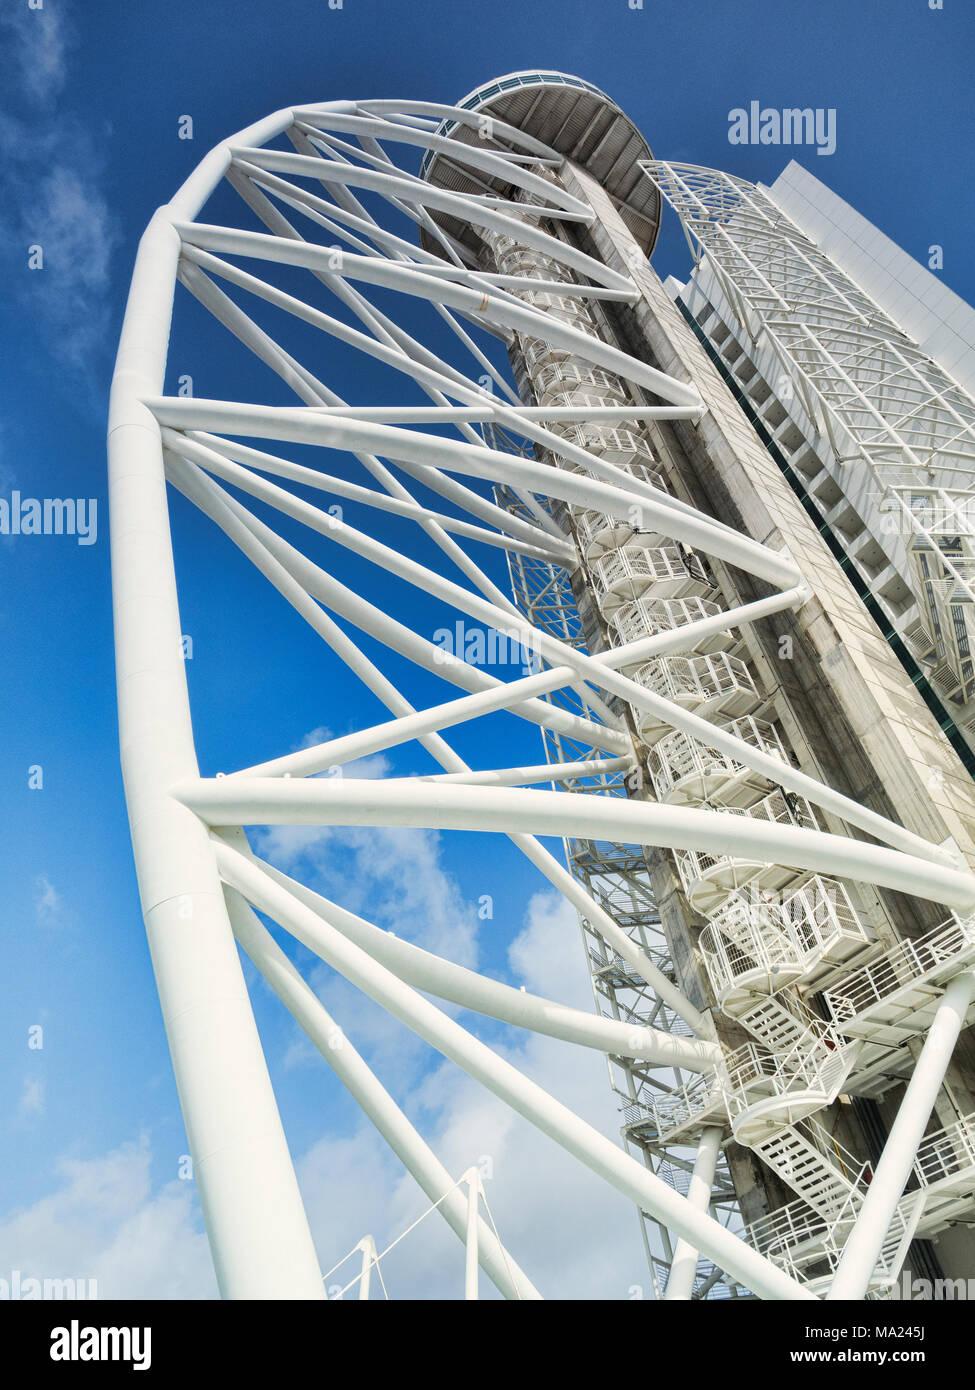 2 March 2018: Lisbon, Portugal - The 145m Vasco da Gama Tower and the Myriad Hotel, Lisbon, Portugal. - Stock Image